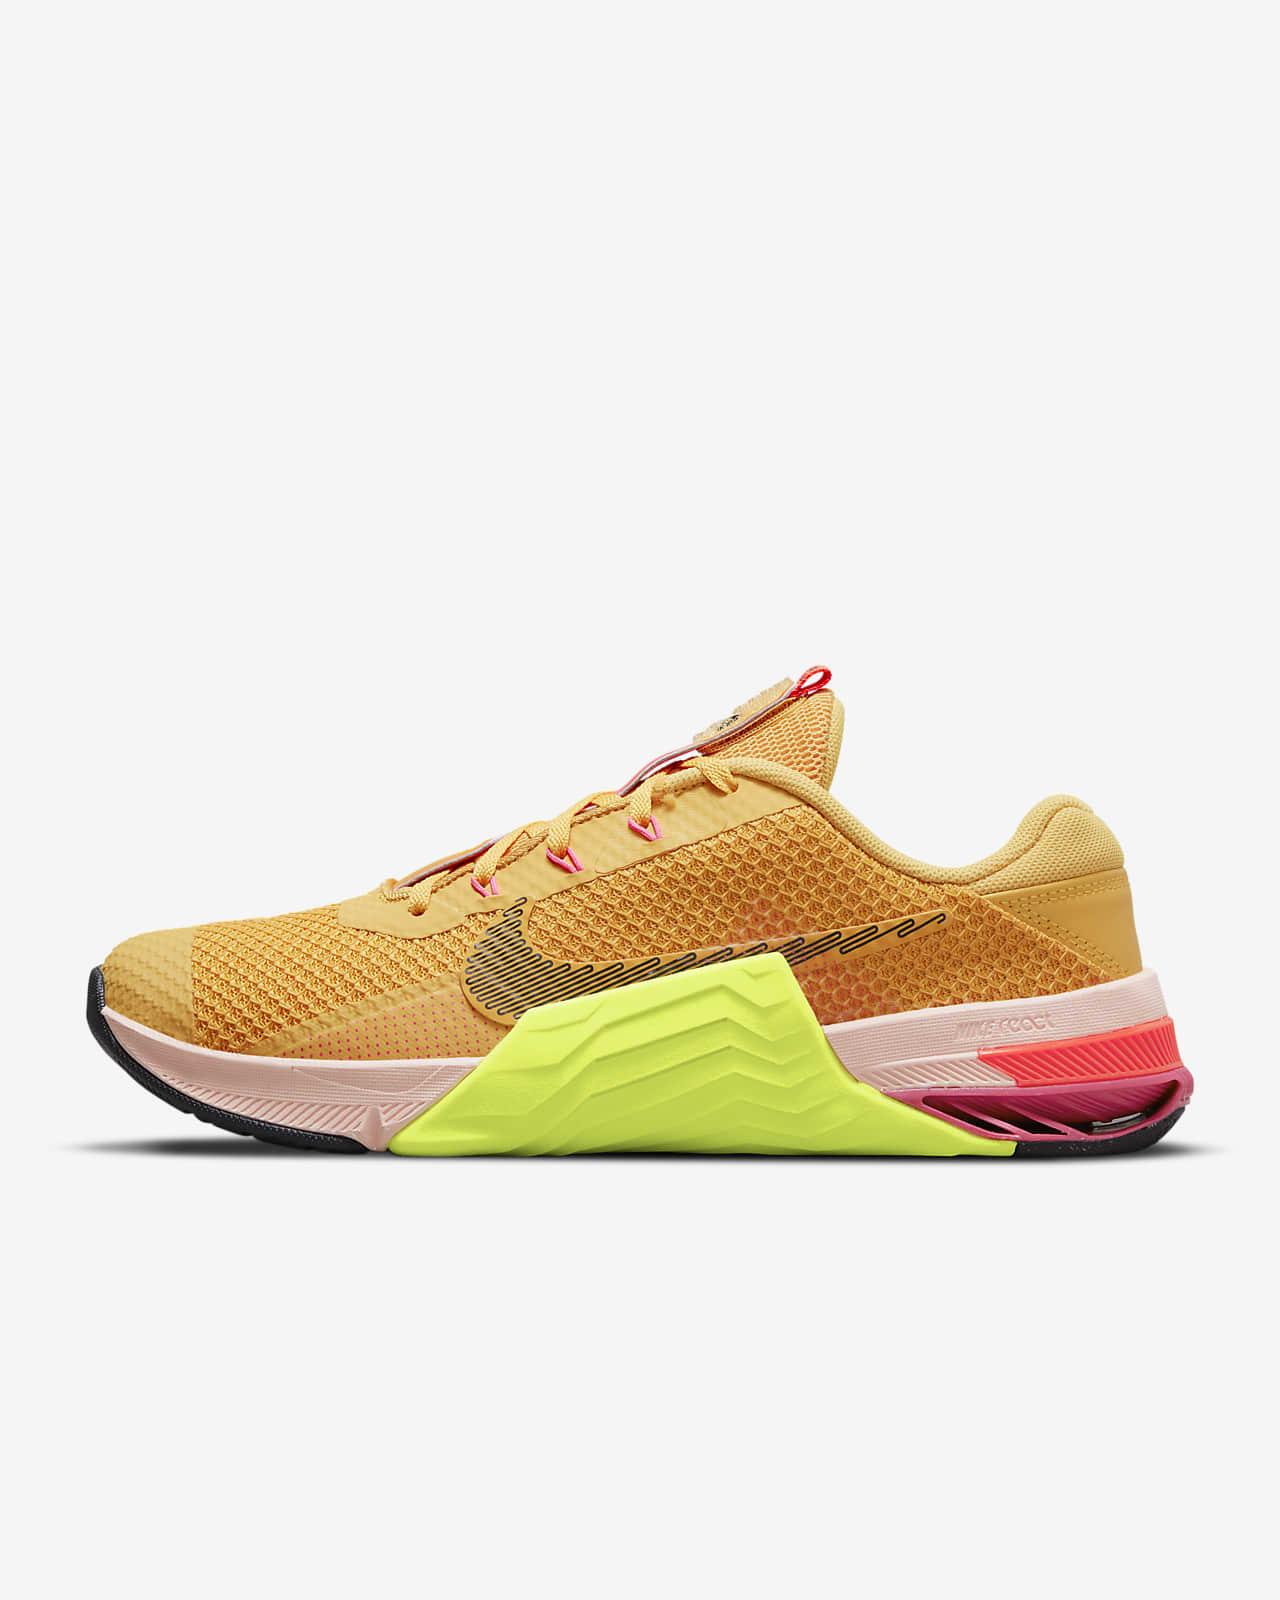 Chaussure de training Nike Metcon 7 X